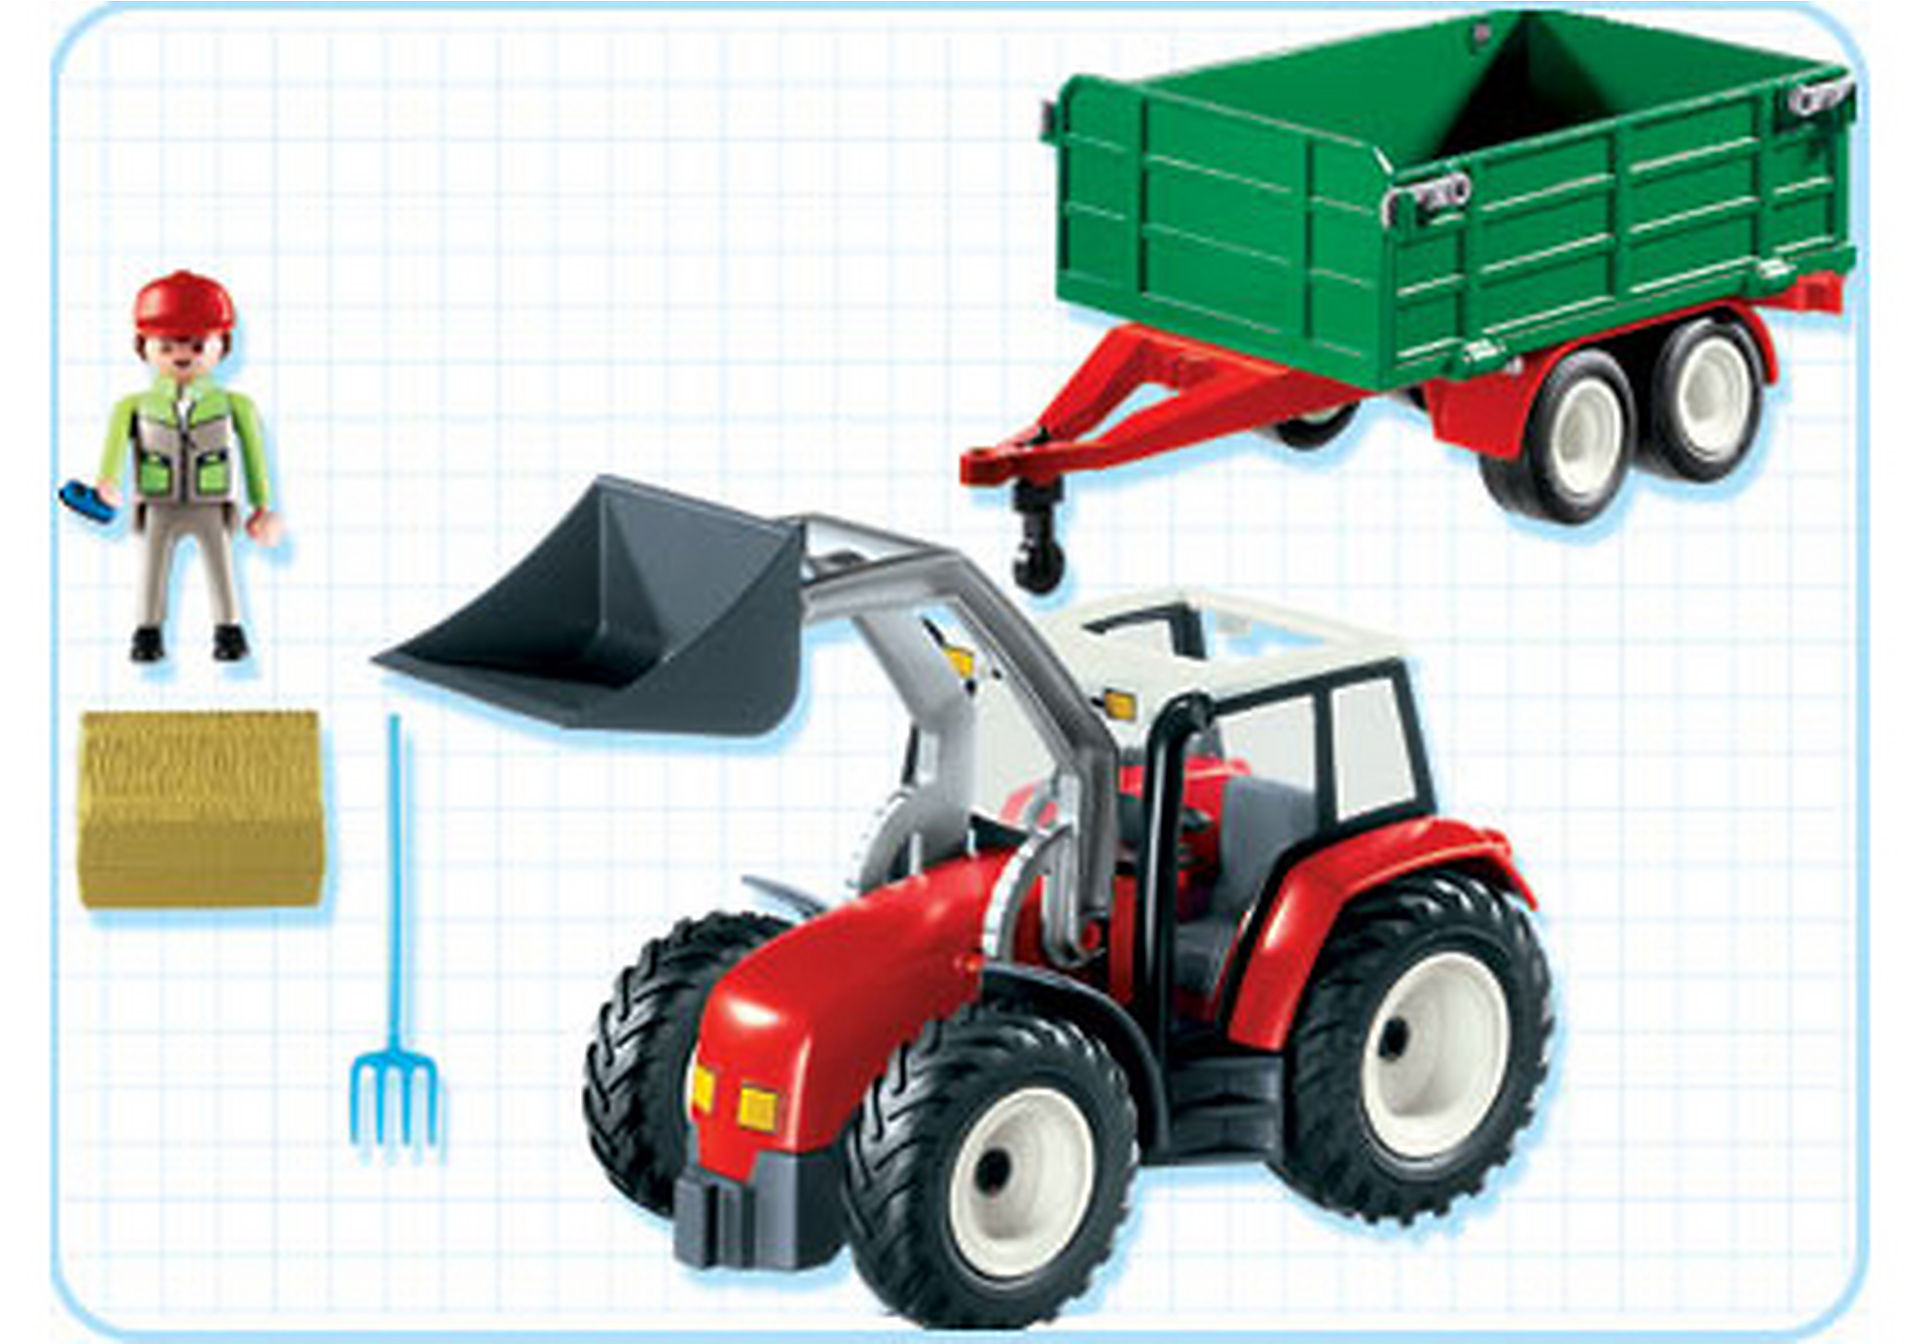 4496-A Großer Traktor mit Anhänger zoom image2